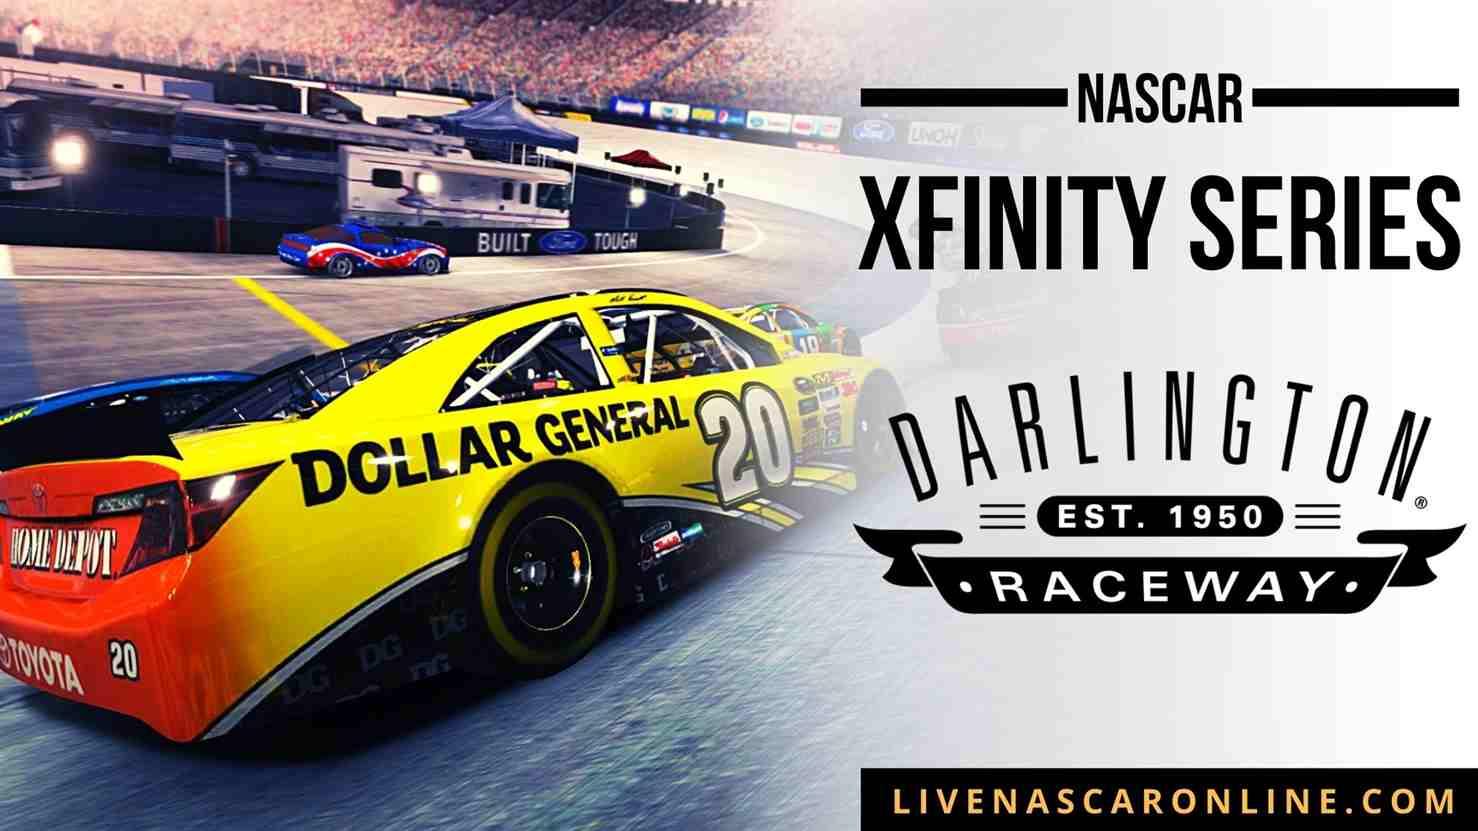 NASCAR Xfinity Race at Darlington Live Stream 2021